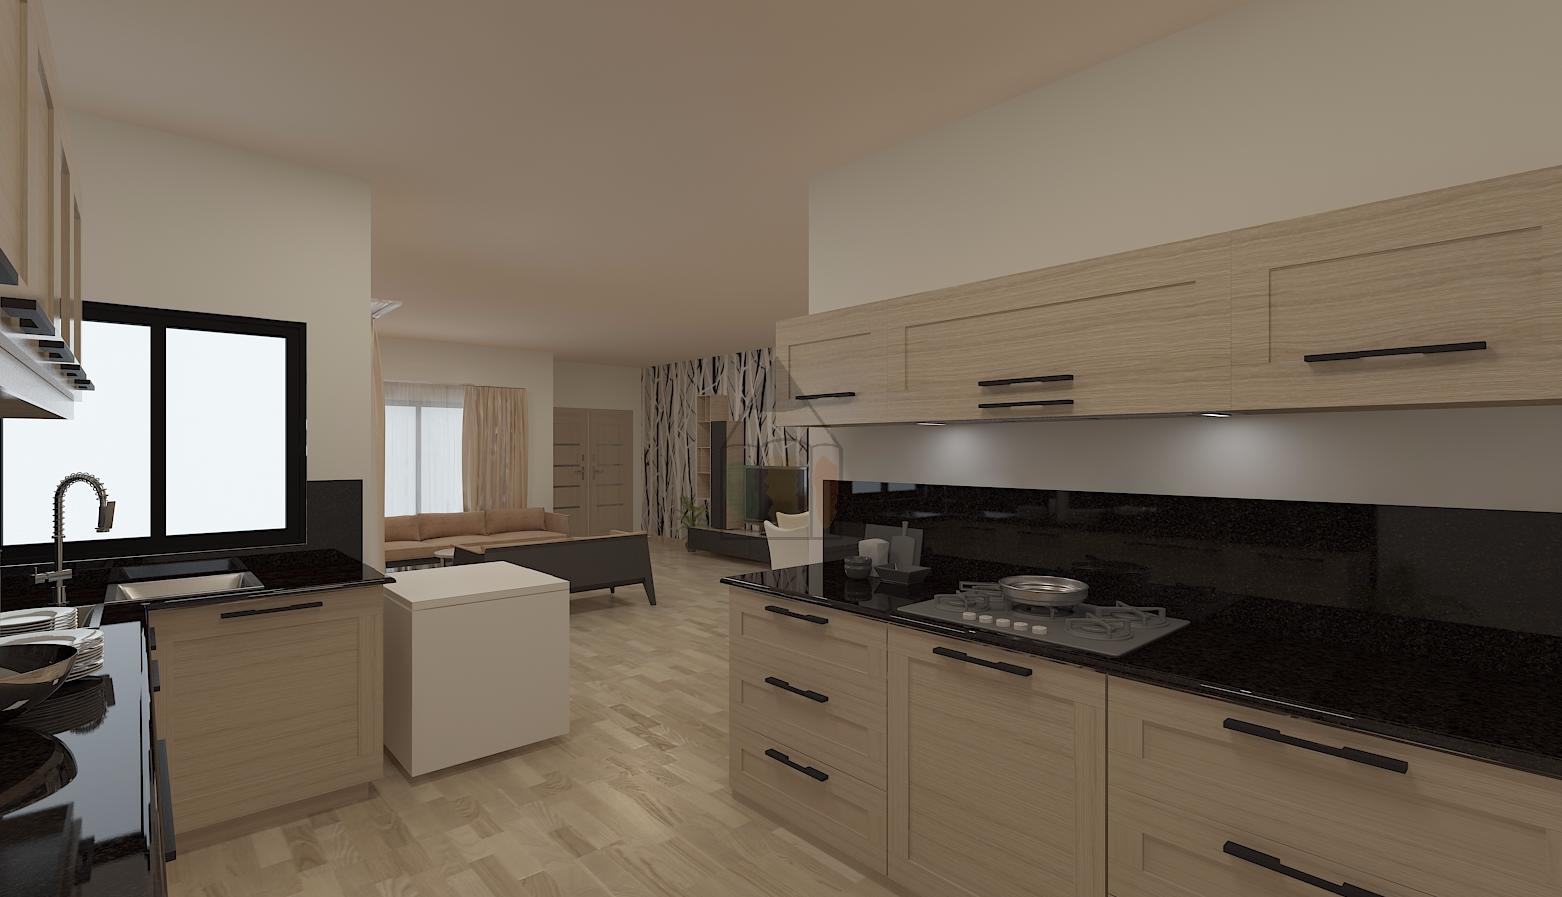 lasani wood kitchen design kitchens pinterest kitchens